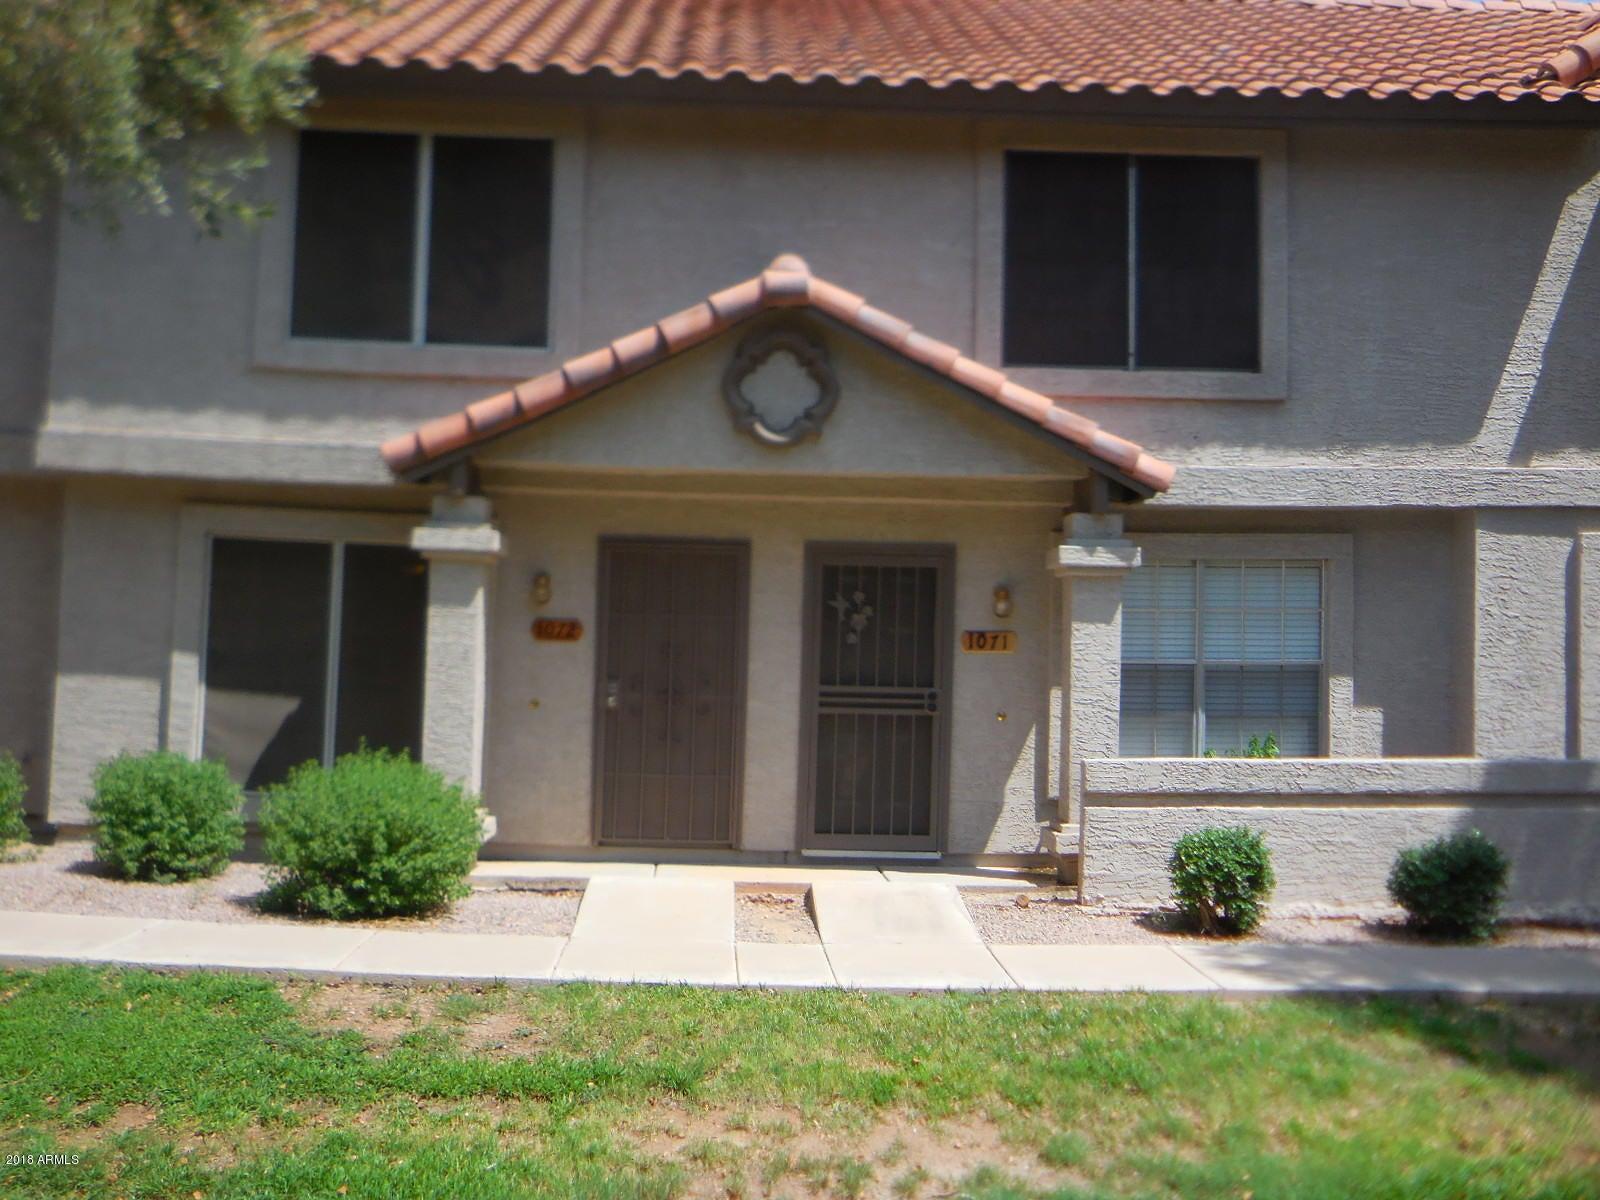 Photo of 1961 N HARTFORD Street #1072, Chandler, AZ 85225